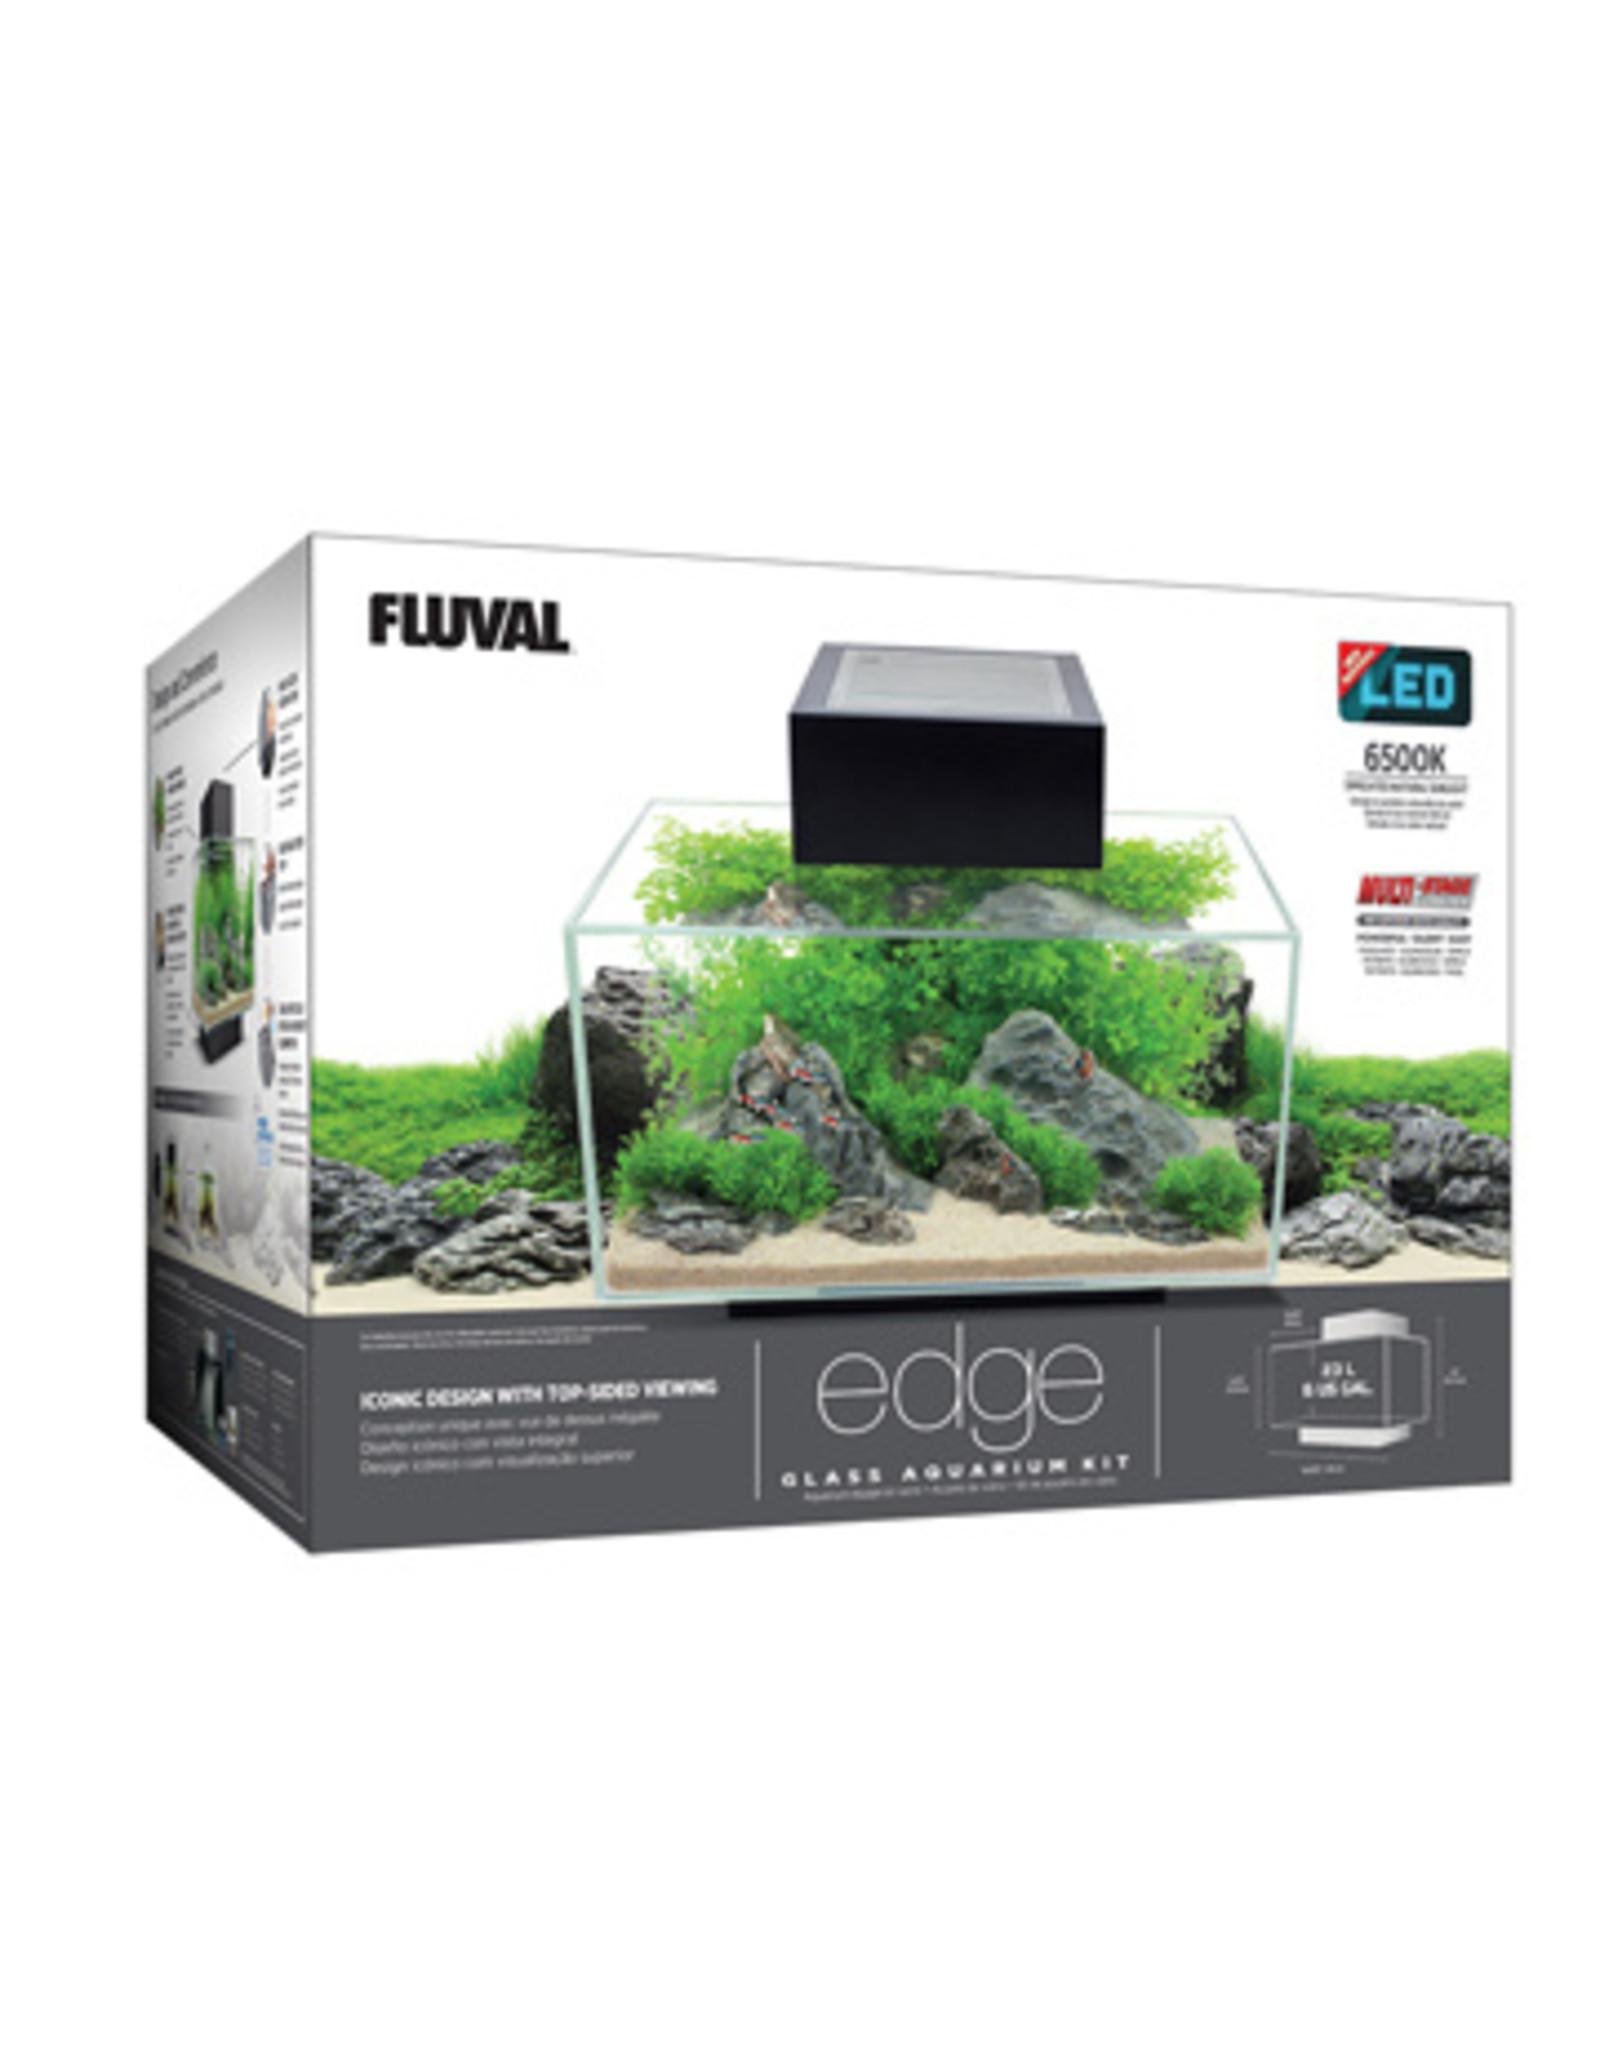 Fluval FLUVAL Edge Aquarium 2.0 Gloss Black